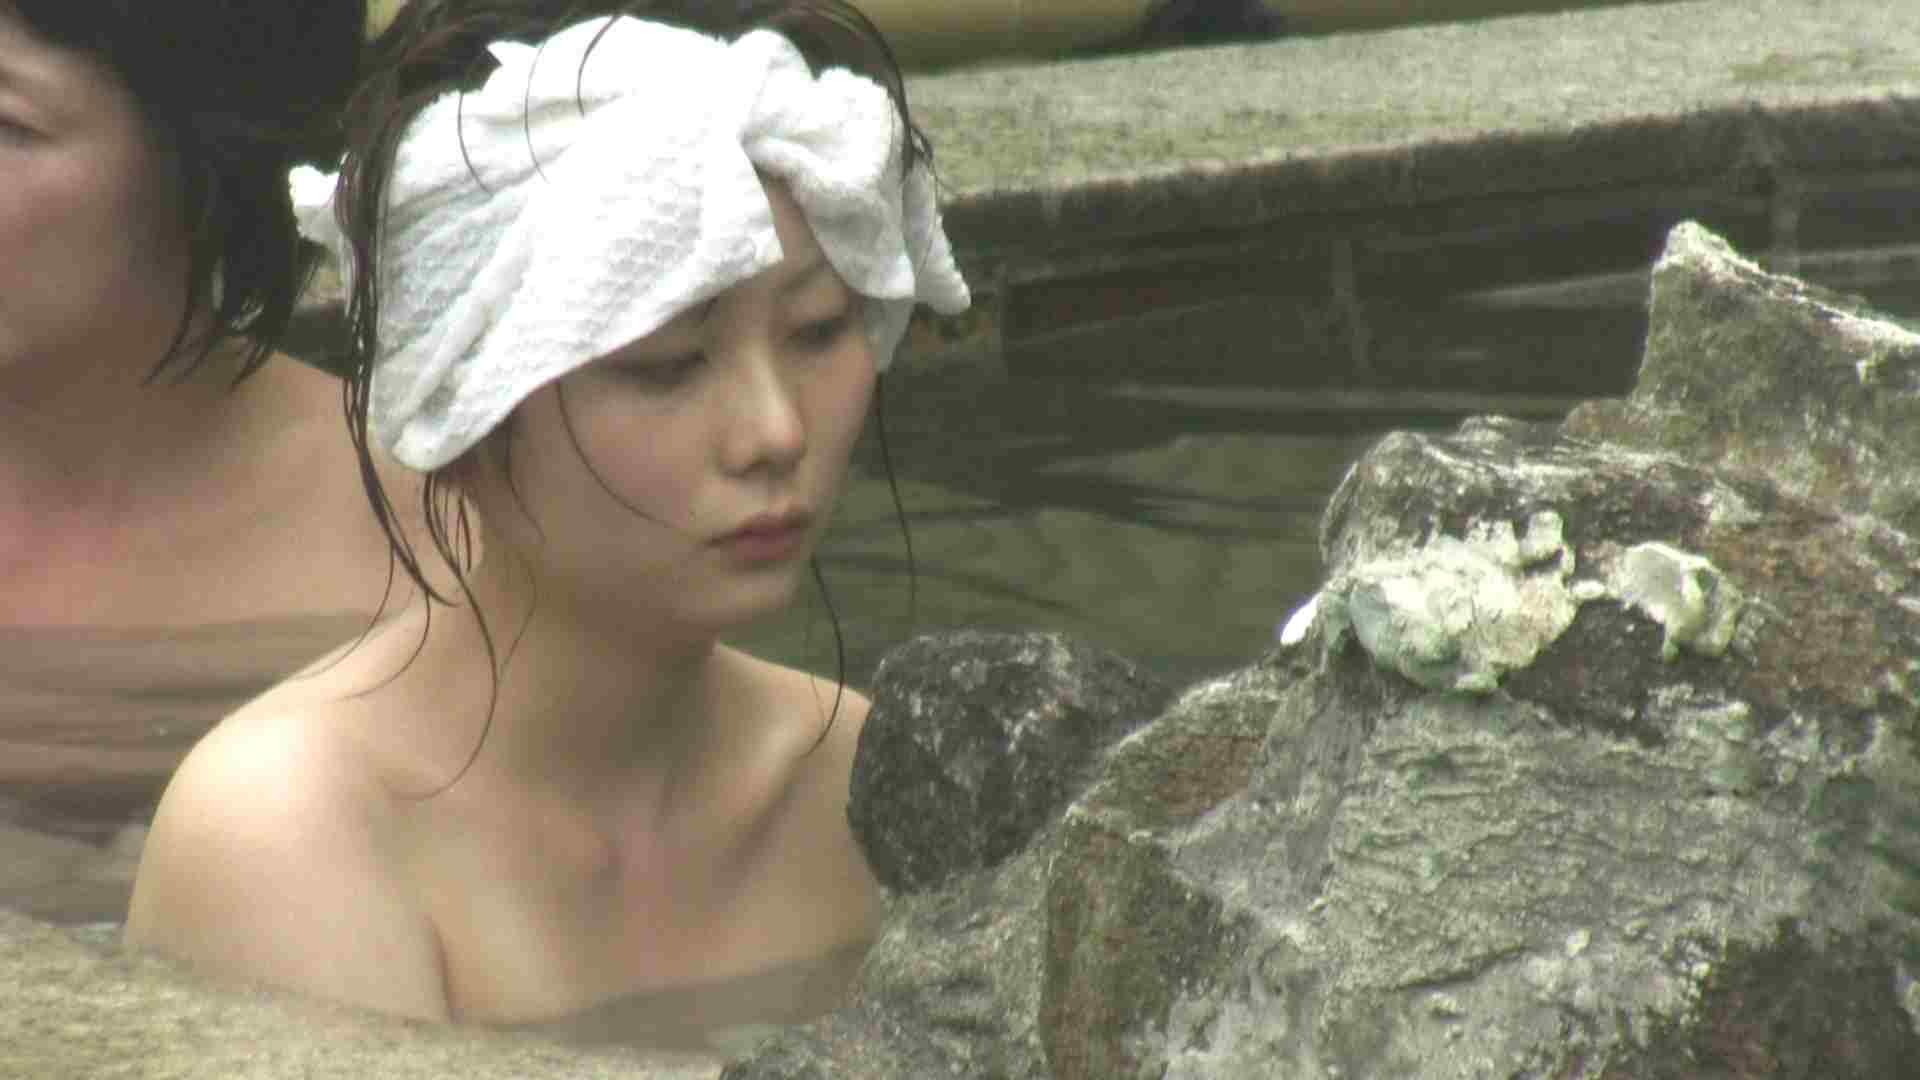 Aquaな露天風呂Vol.147 盗撮 | OLセックス  85画像 16